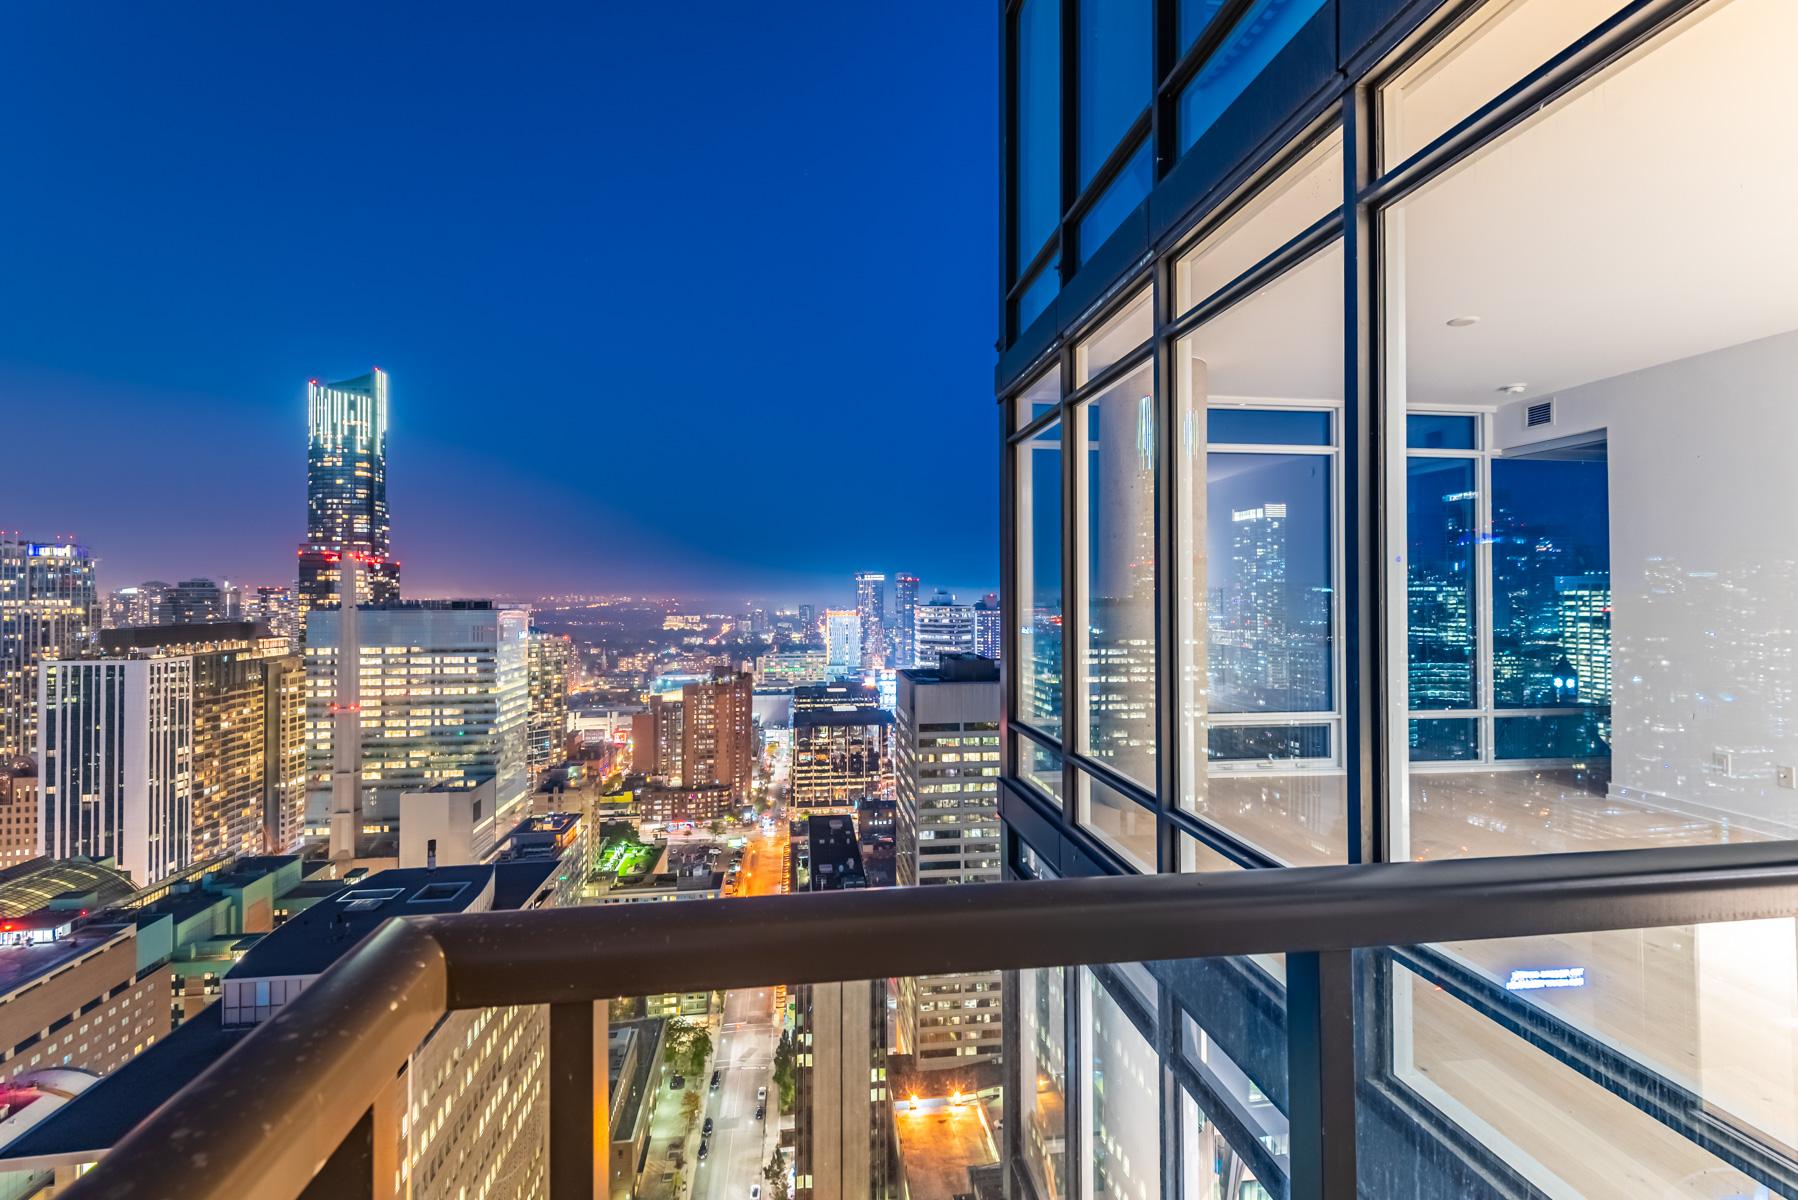 Night view of brightly lit Toronto skyline from 488 University Ave balcony.